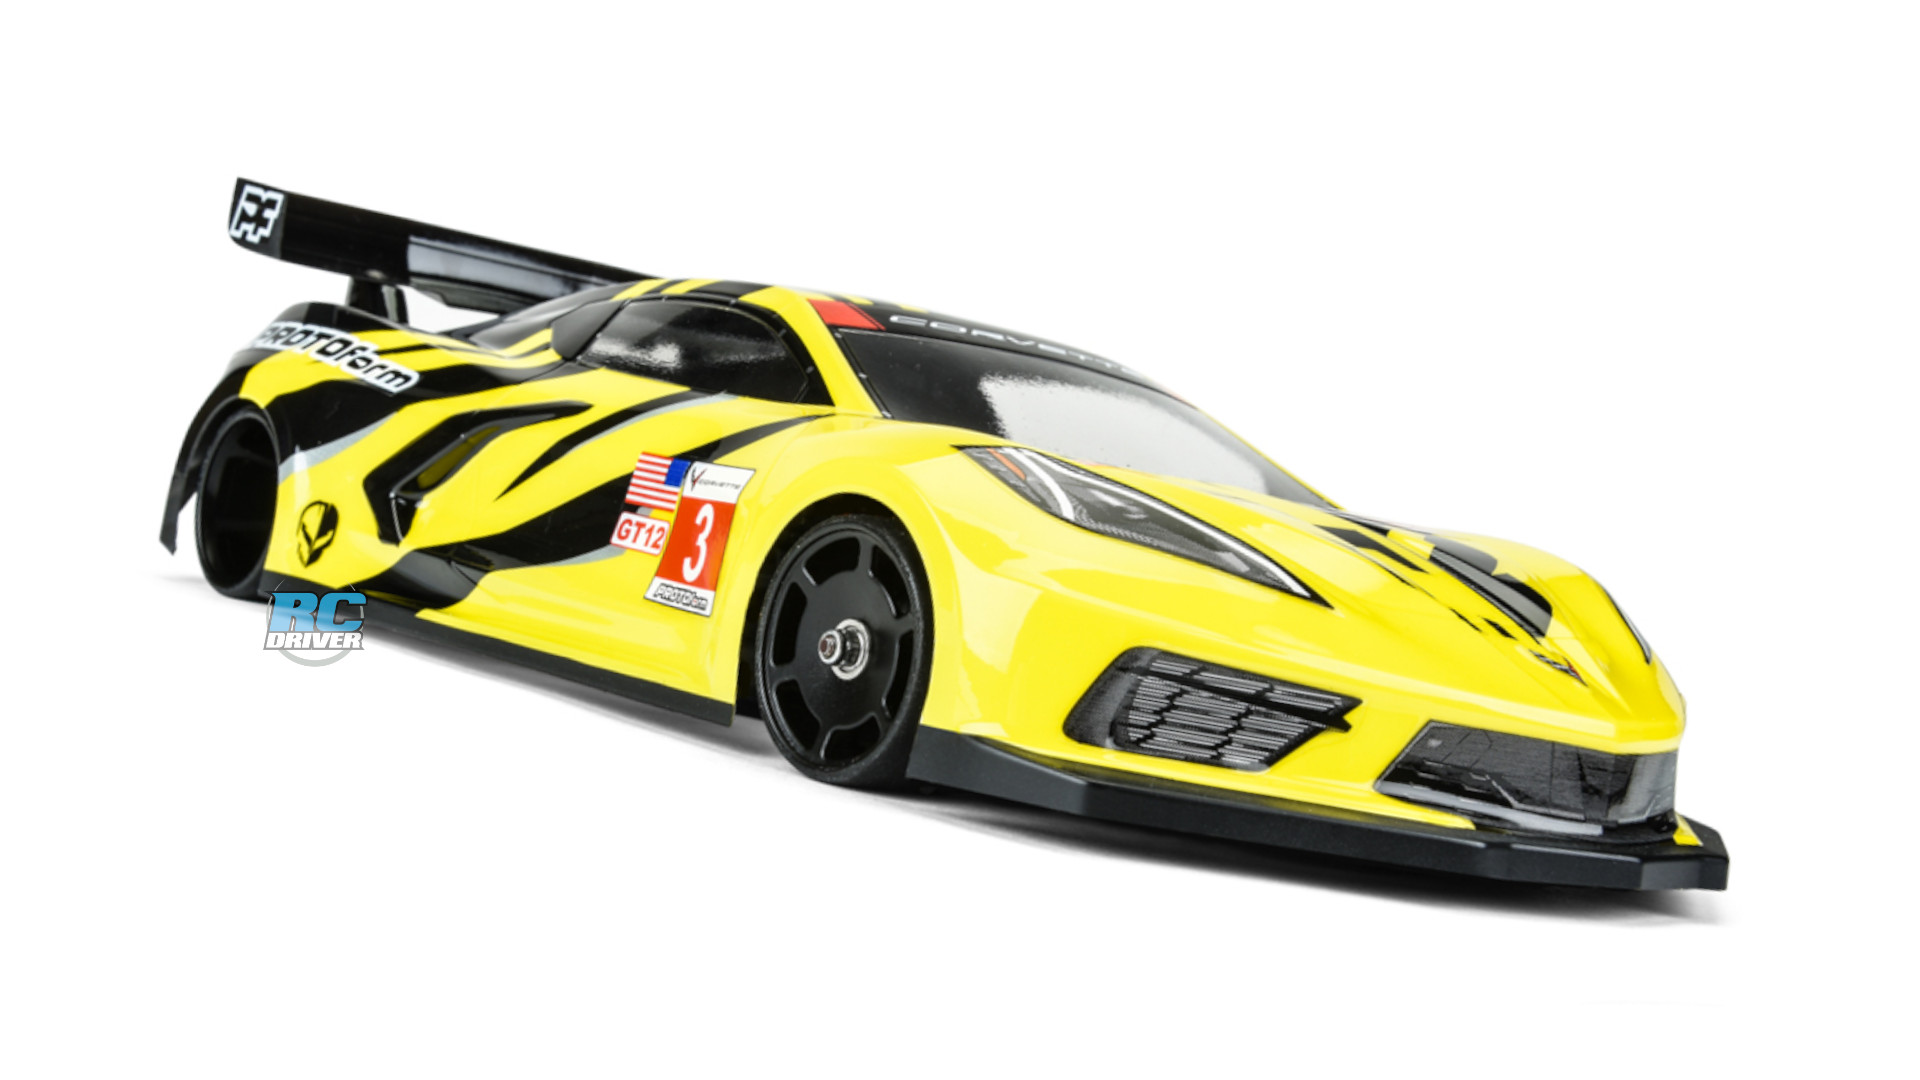 Now for GT12 - PROTOform Chevrolet Corvette C8 body